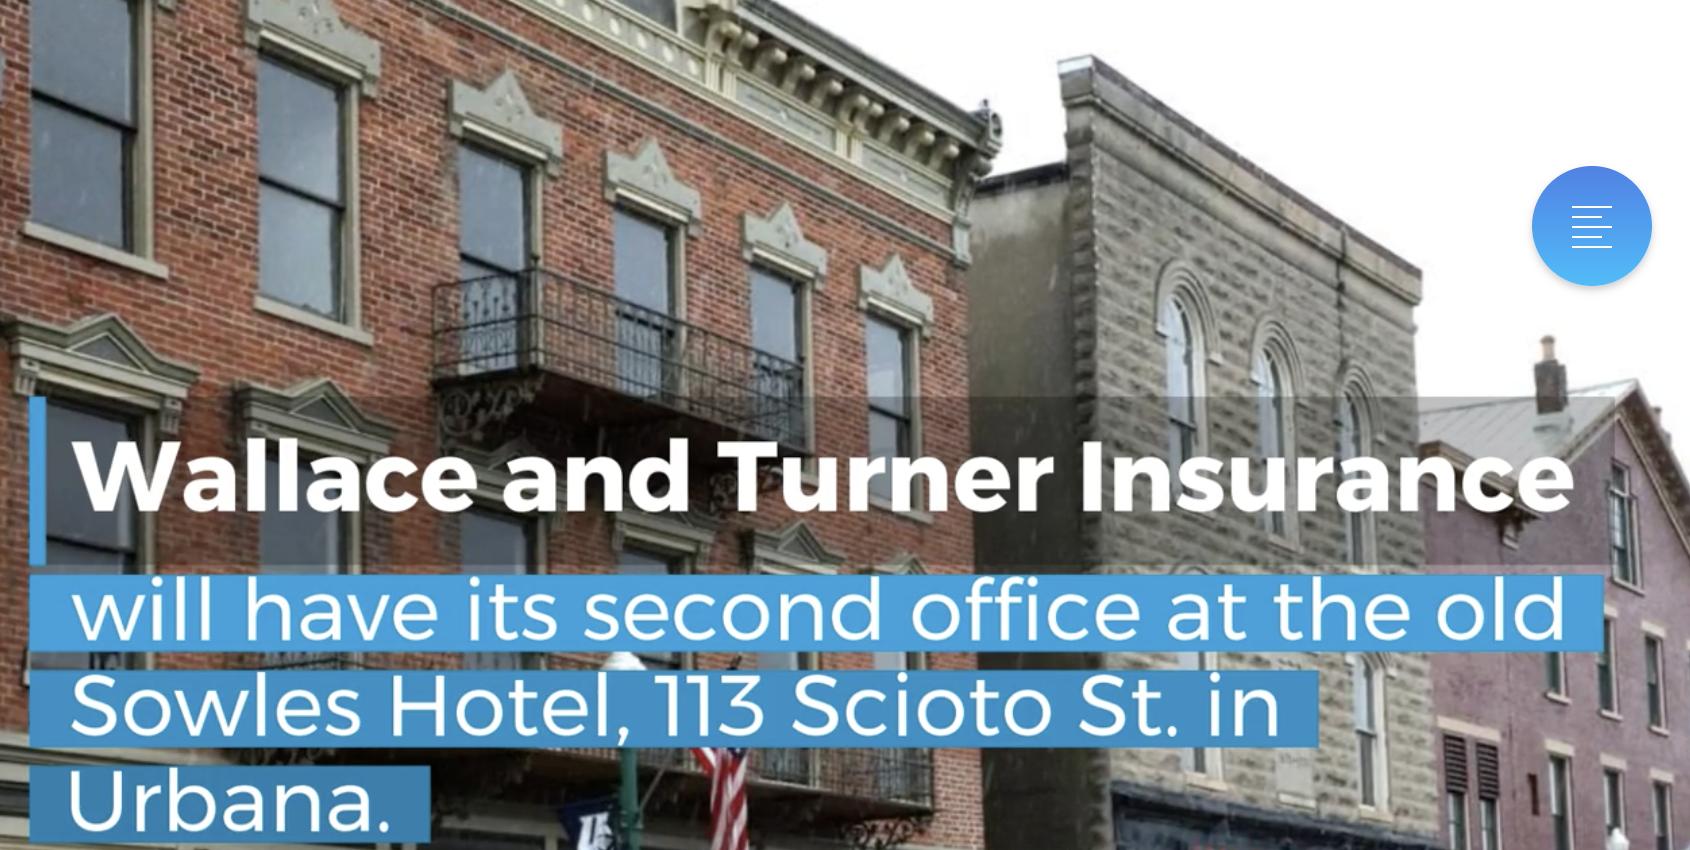 Springfield-News Sun Urbana Office Hotel Sowles